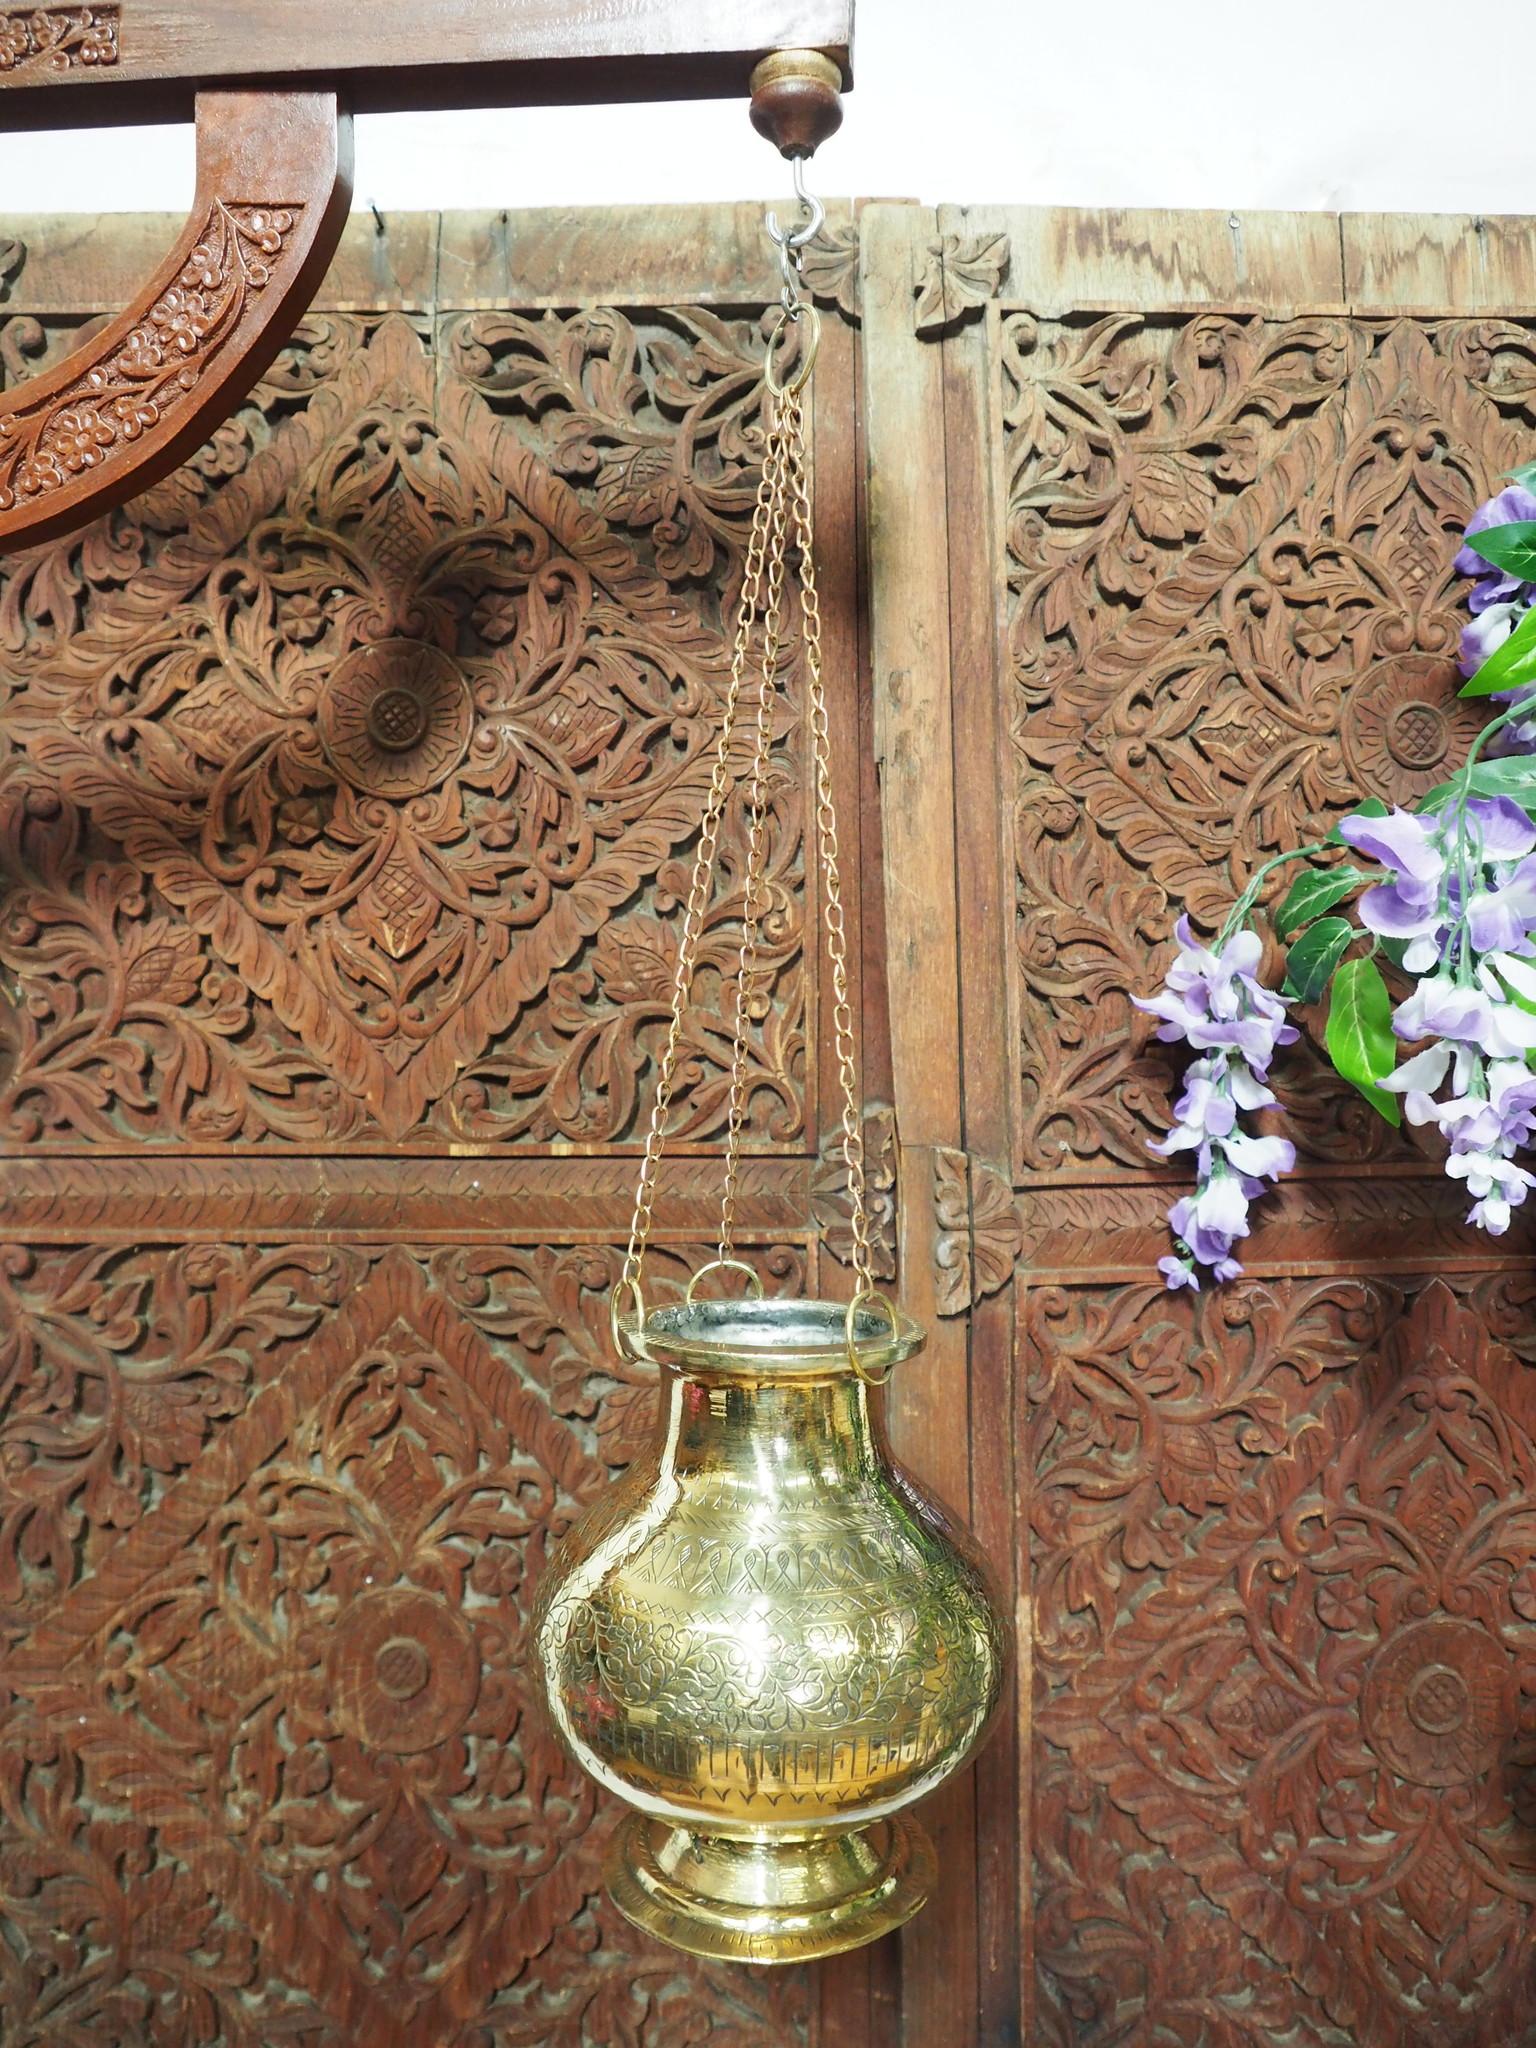 2,5 Liter antik orient Massiv Messing Ayurveda Shirodhara Stirnguss Stirnölguss öl-Therapie Panchakarma Yoga Dhara Vessel gefäß -Nr: 21/13